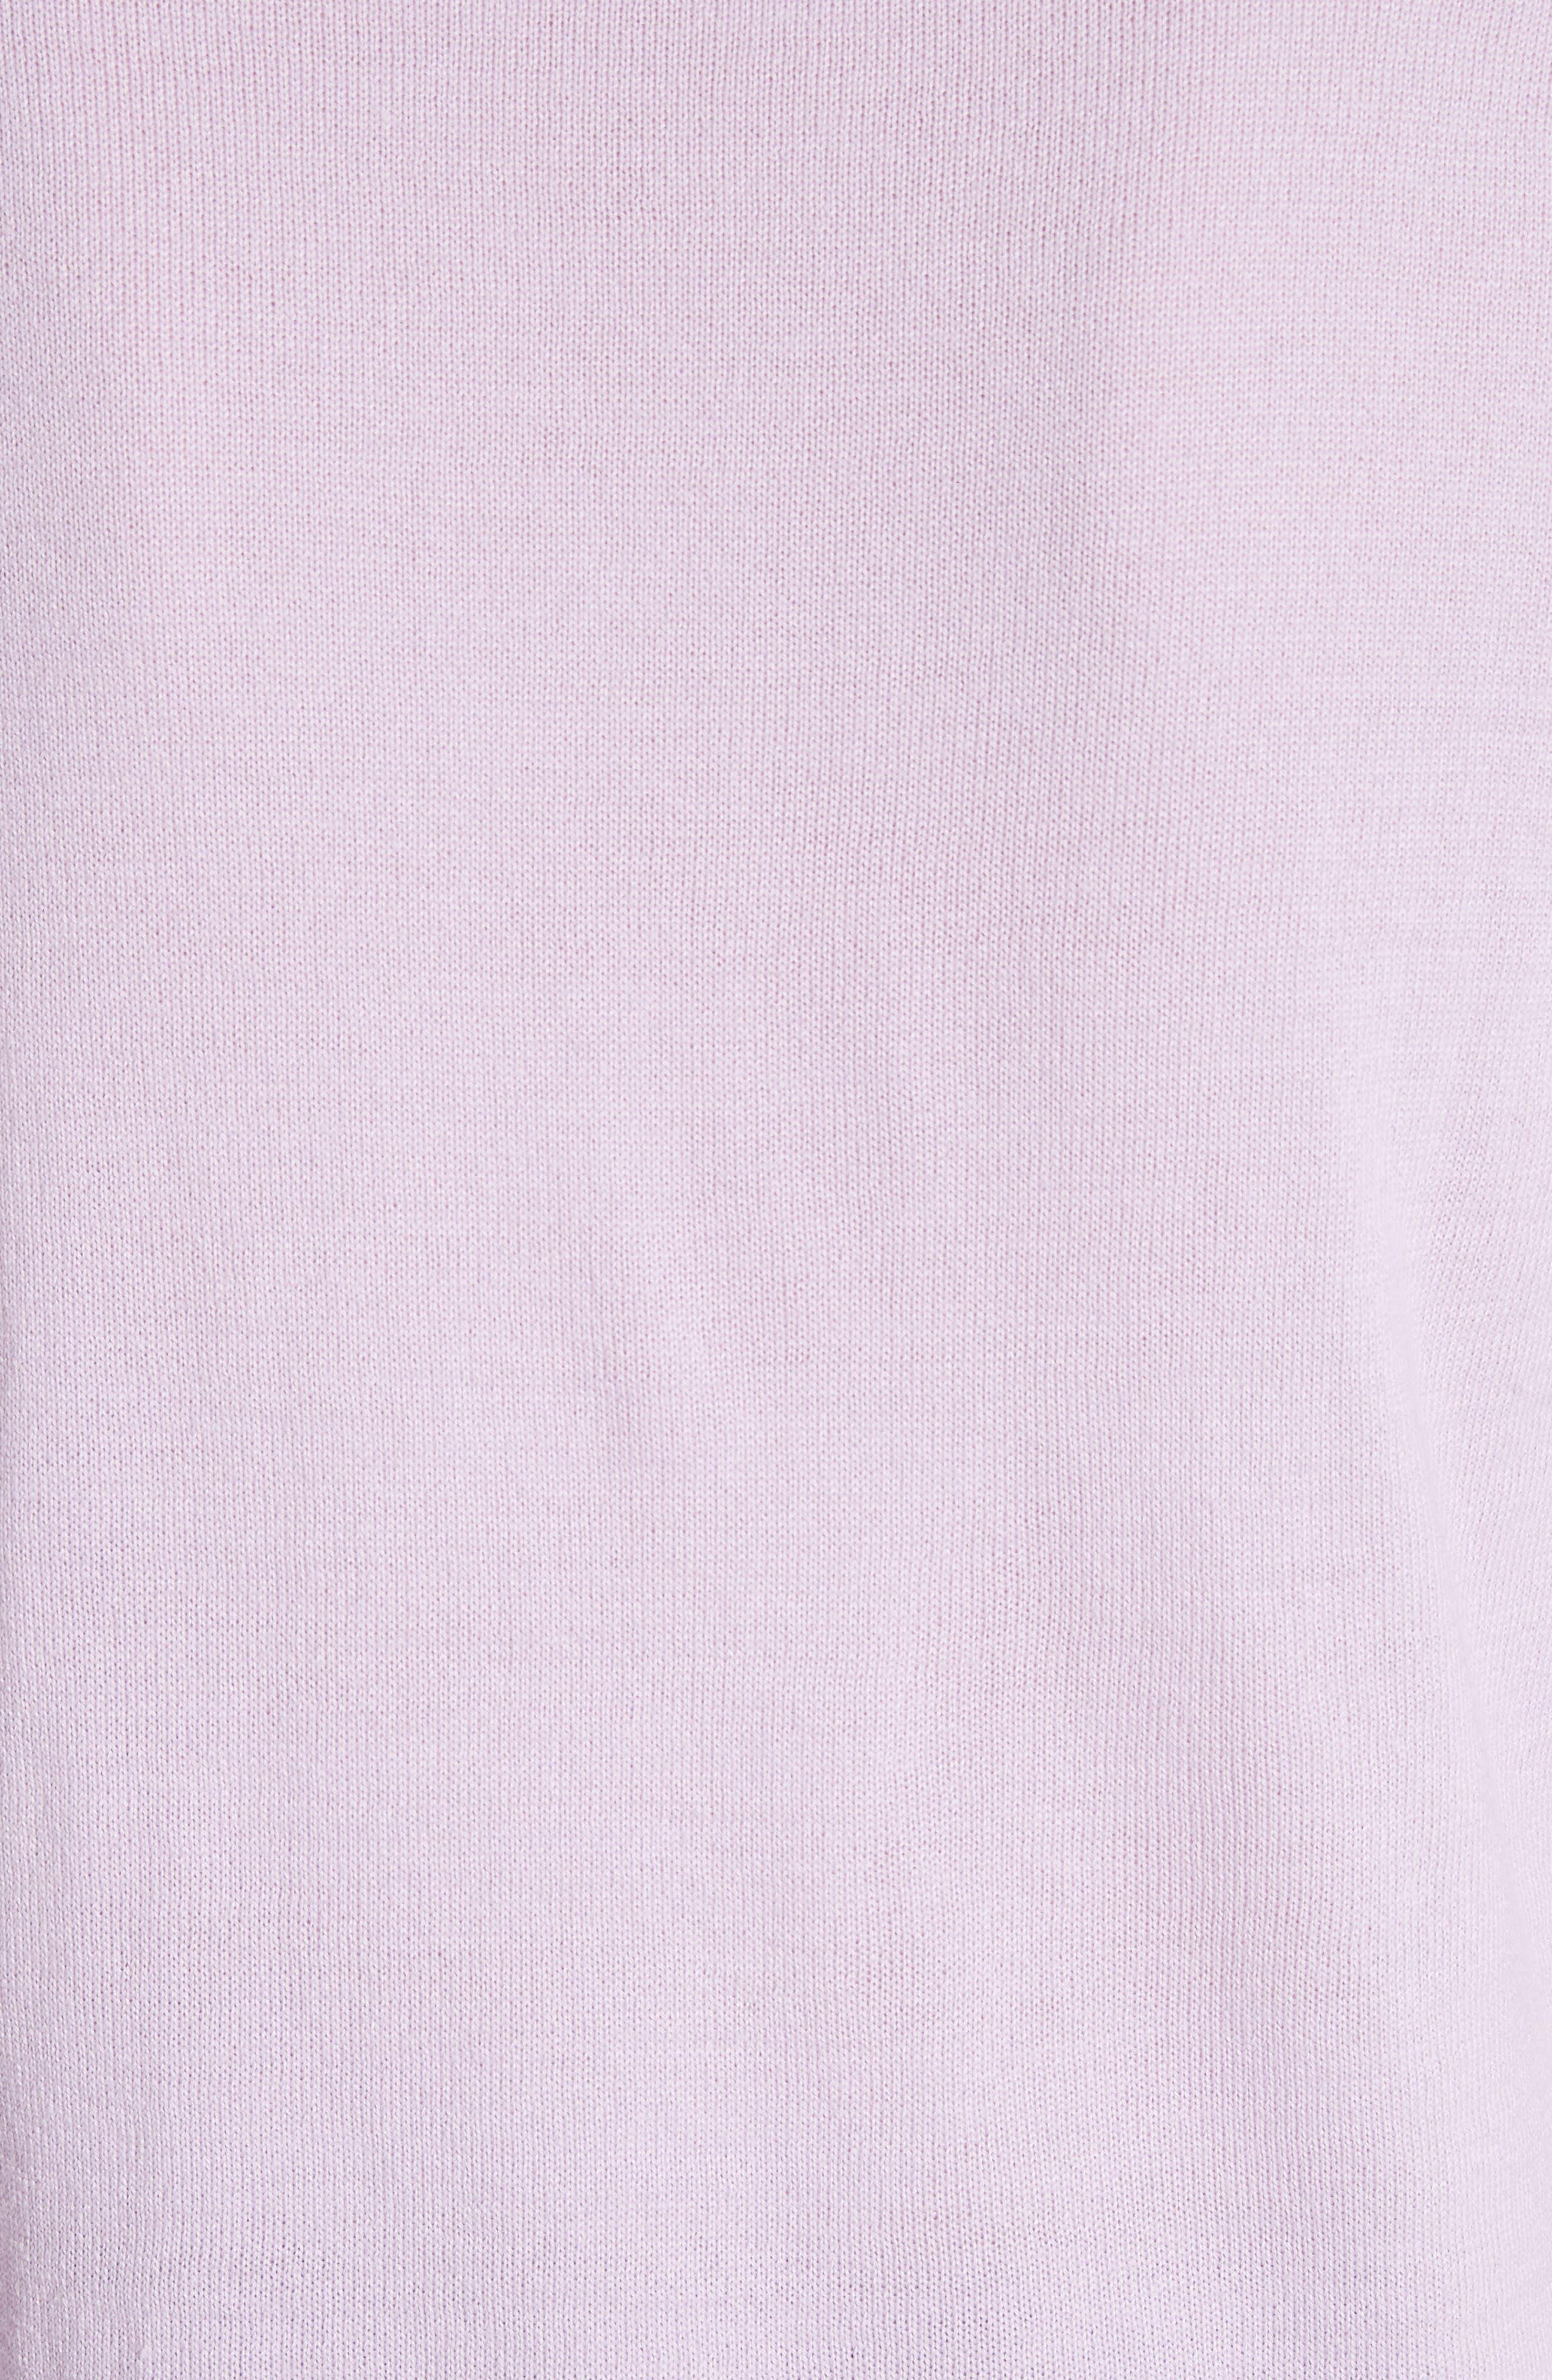 Sheer Panel Crewneck Sweater,                             Alternate thumbnail 5, color,                             500